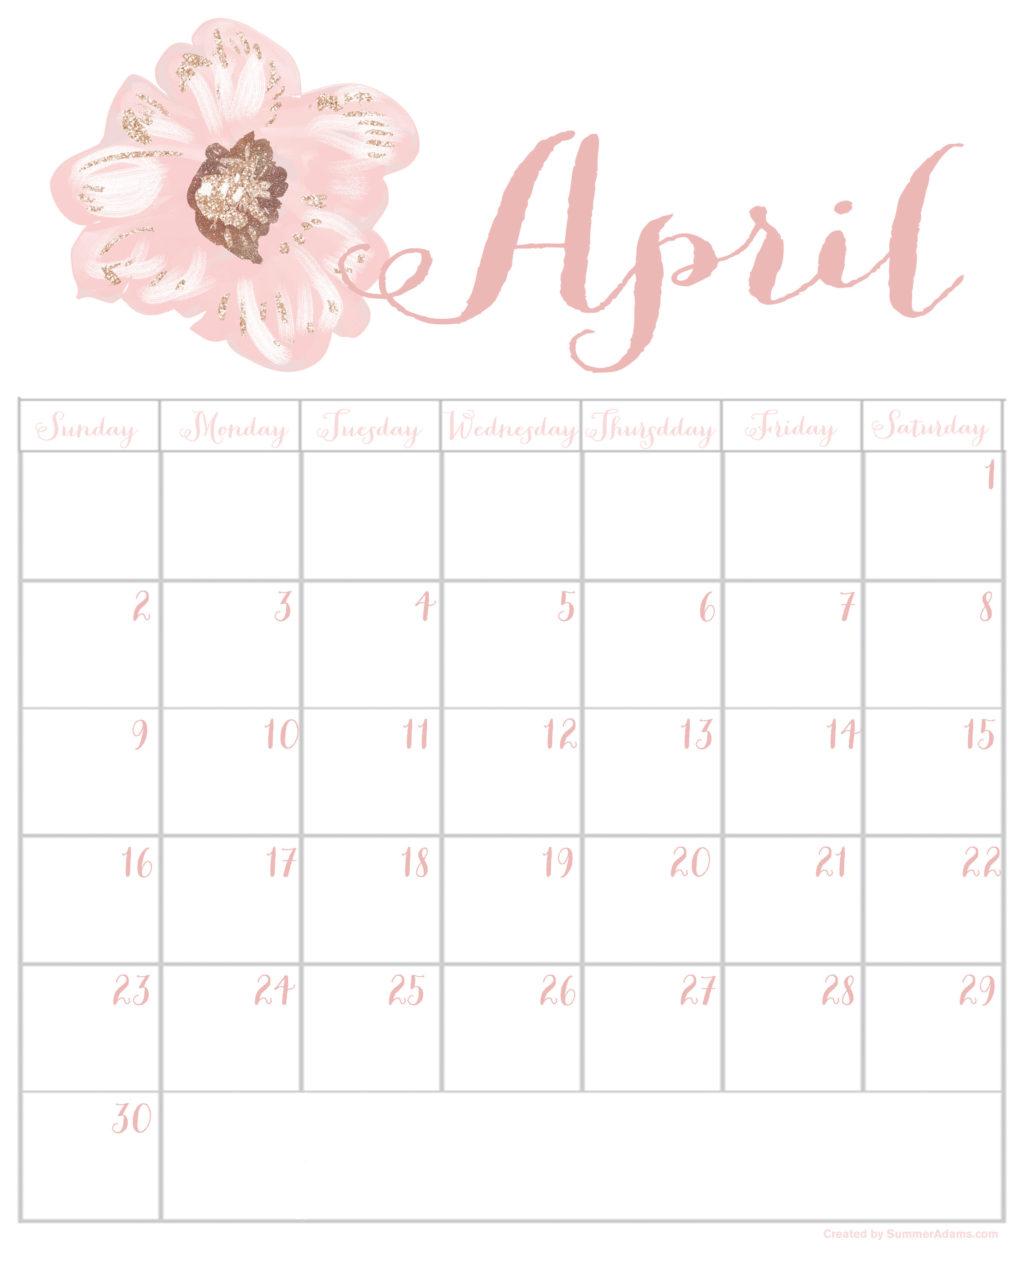 printable calendar: Free April 2017 Printable Calendar